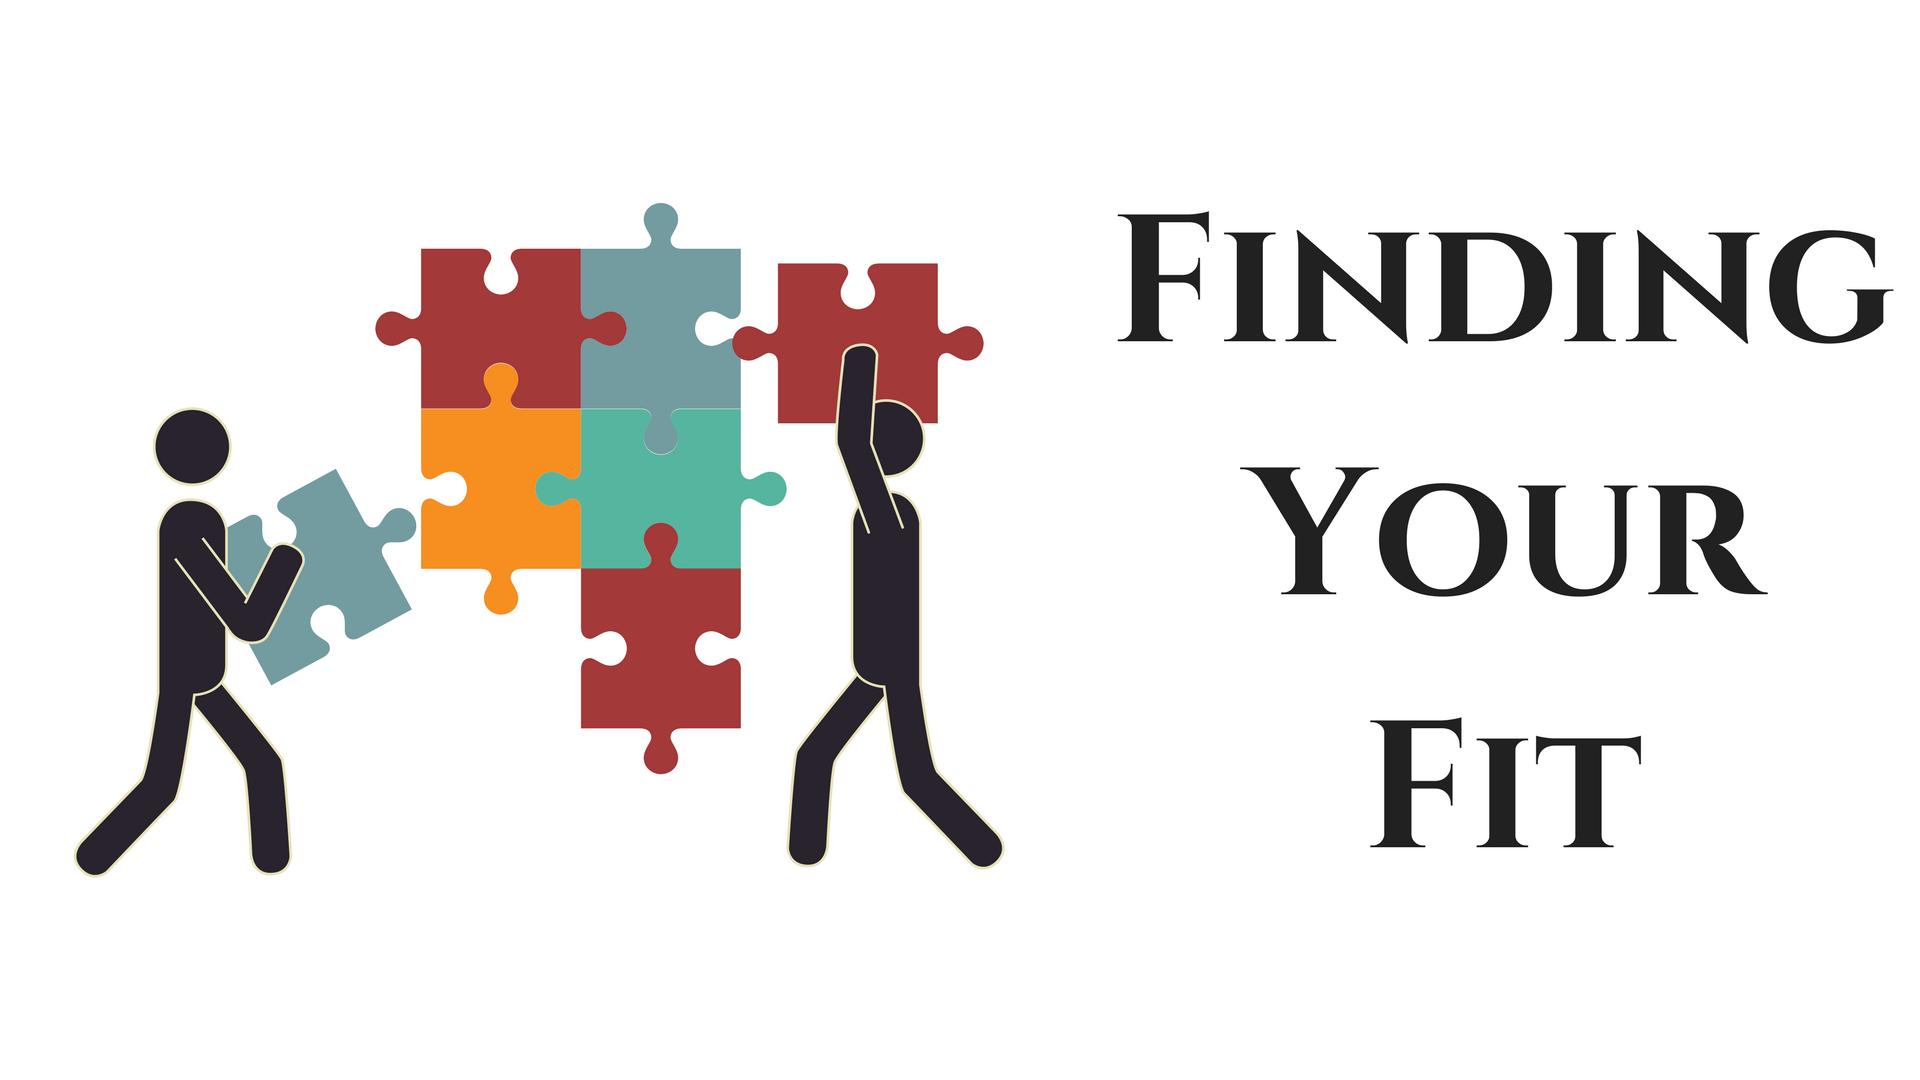 Findingyourfit